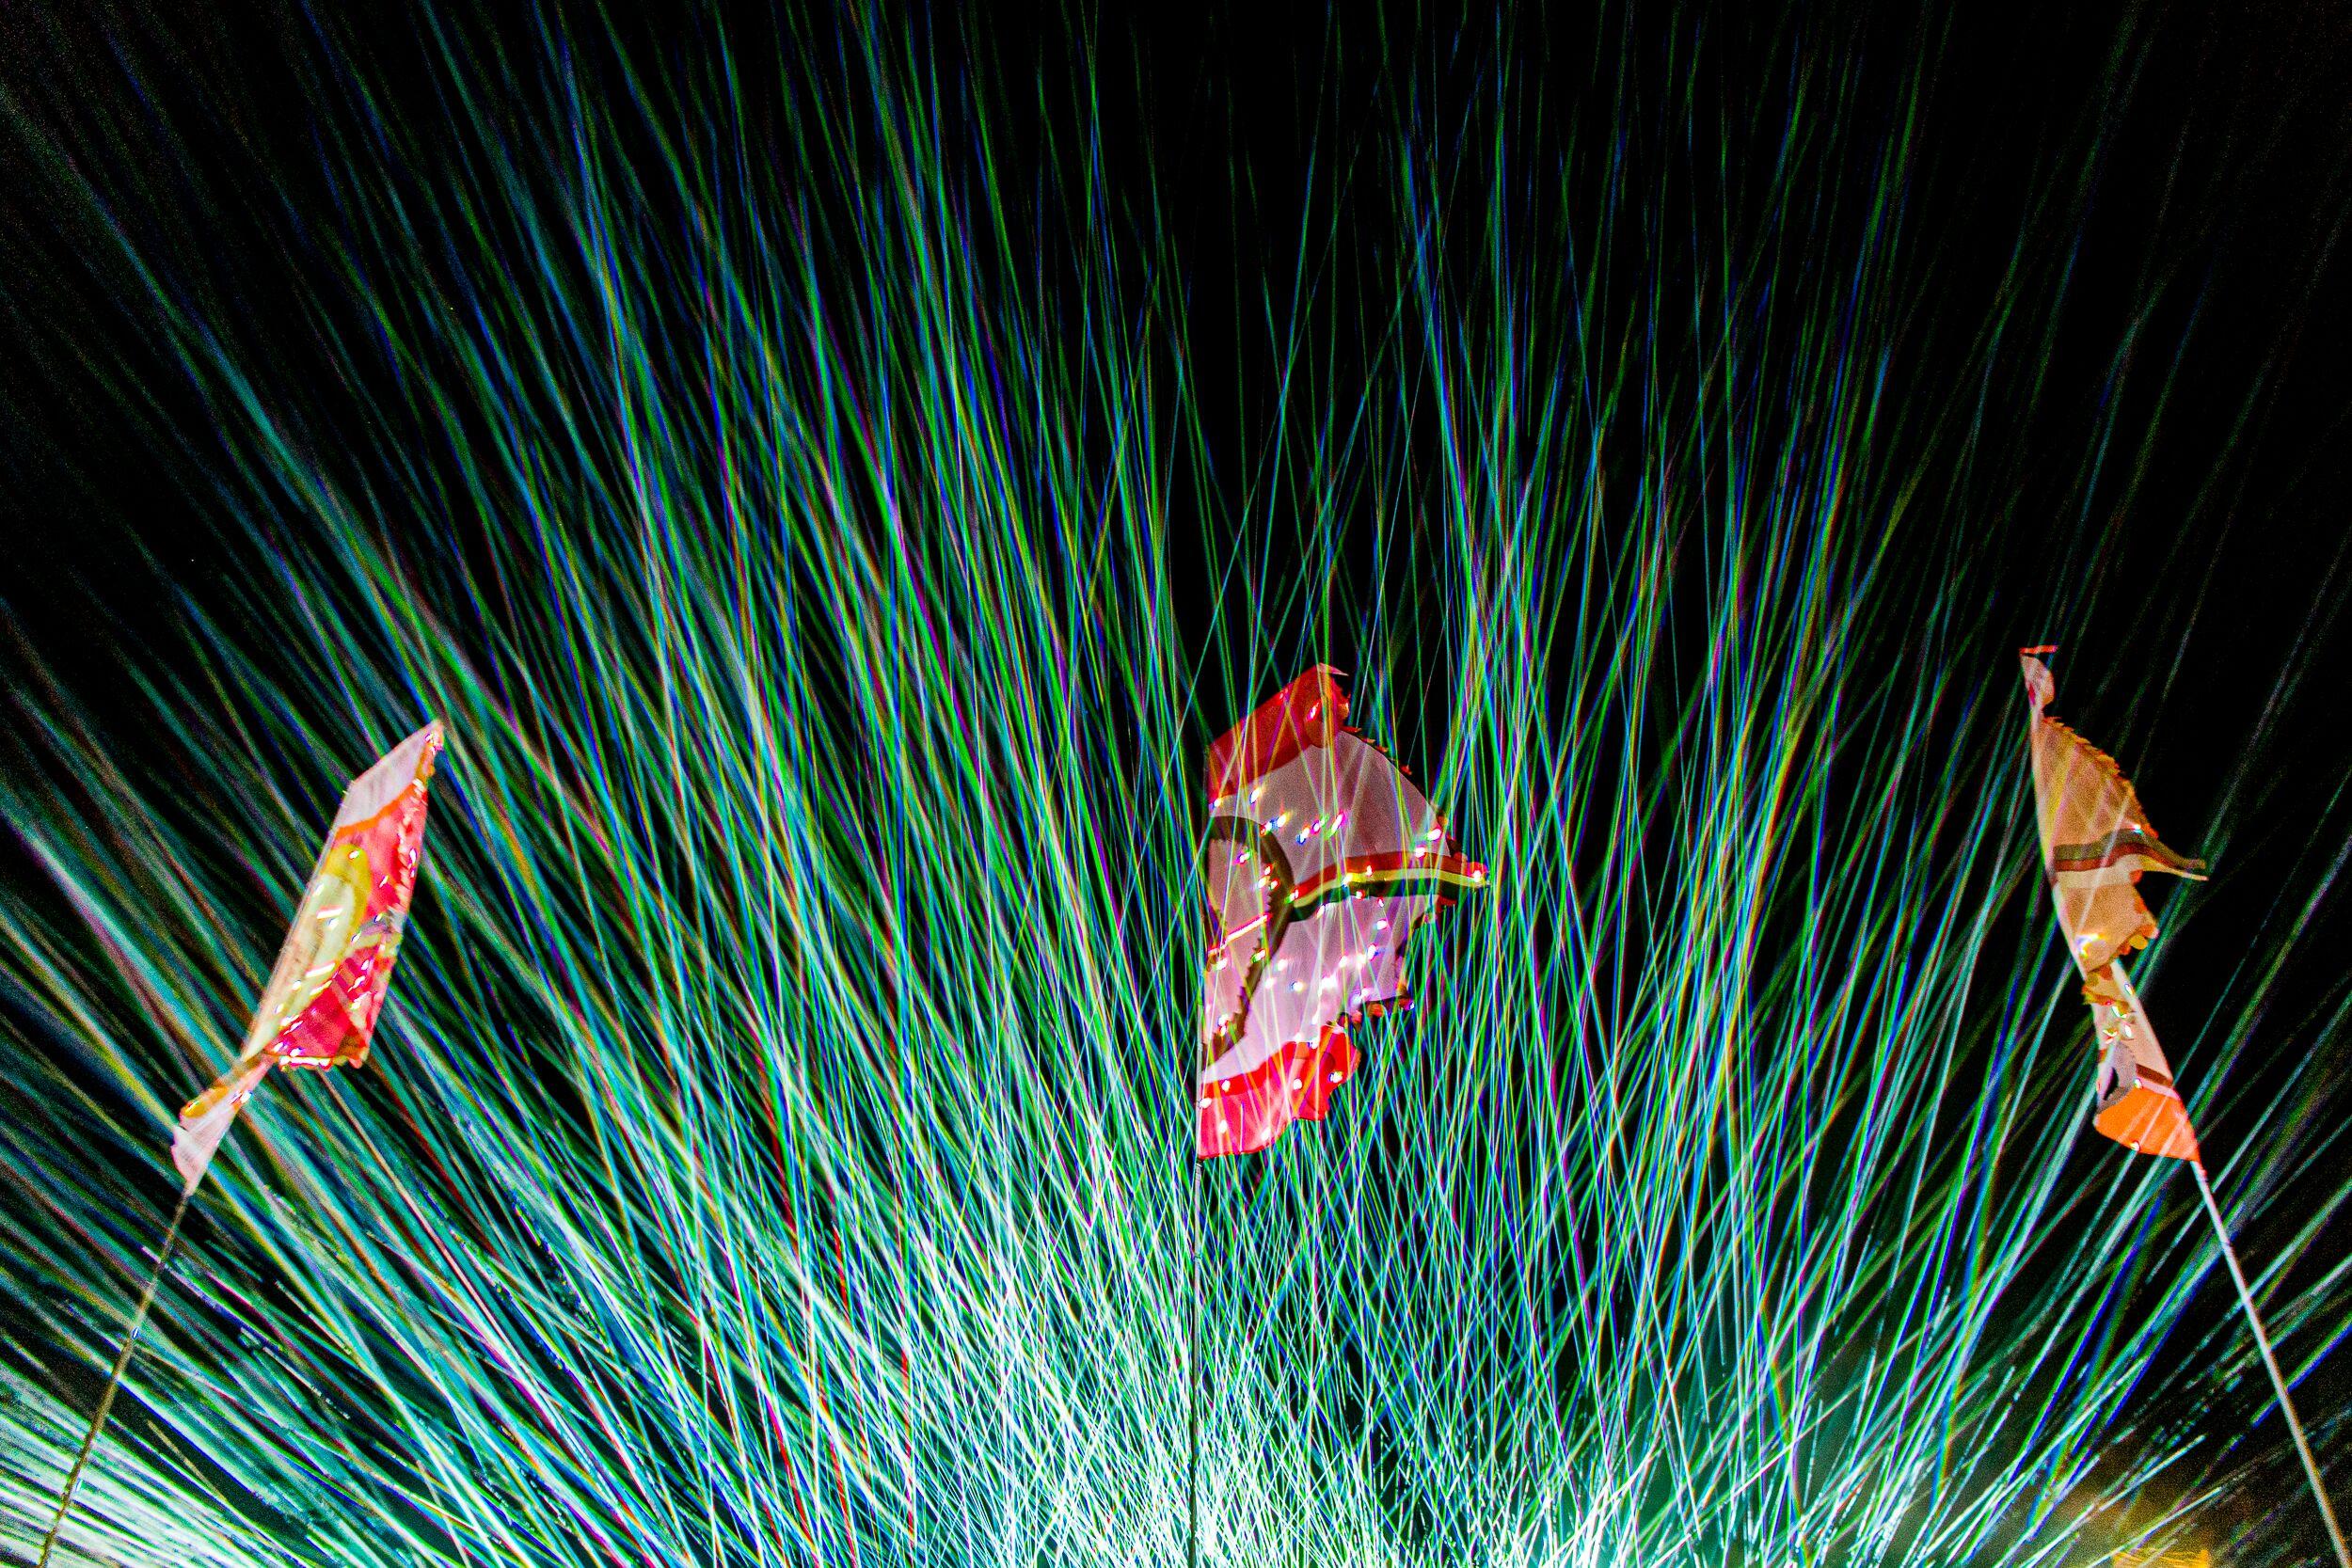 Lasershow tijdens Pukkelpop 2019 - Fotocredits: Jokko - Bron: Persfoto Pukkelpop